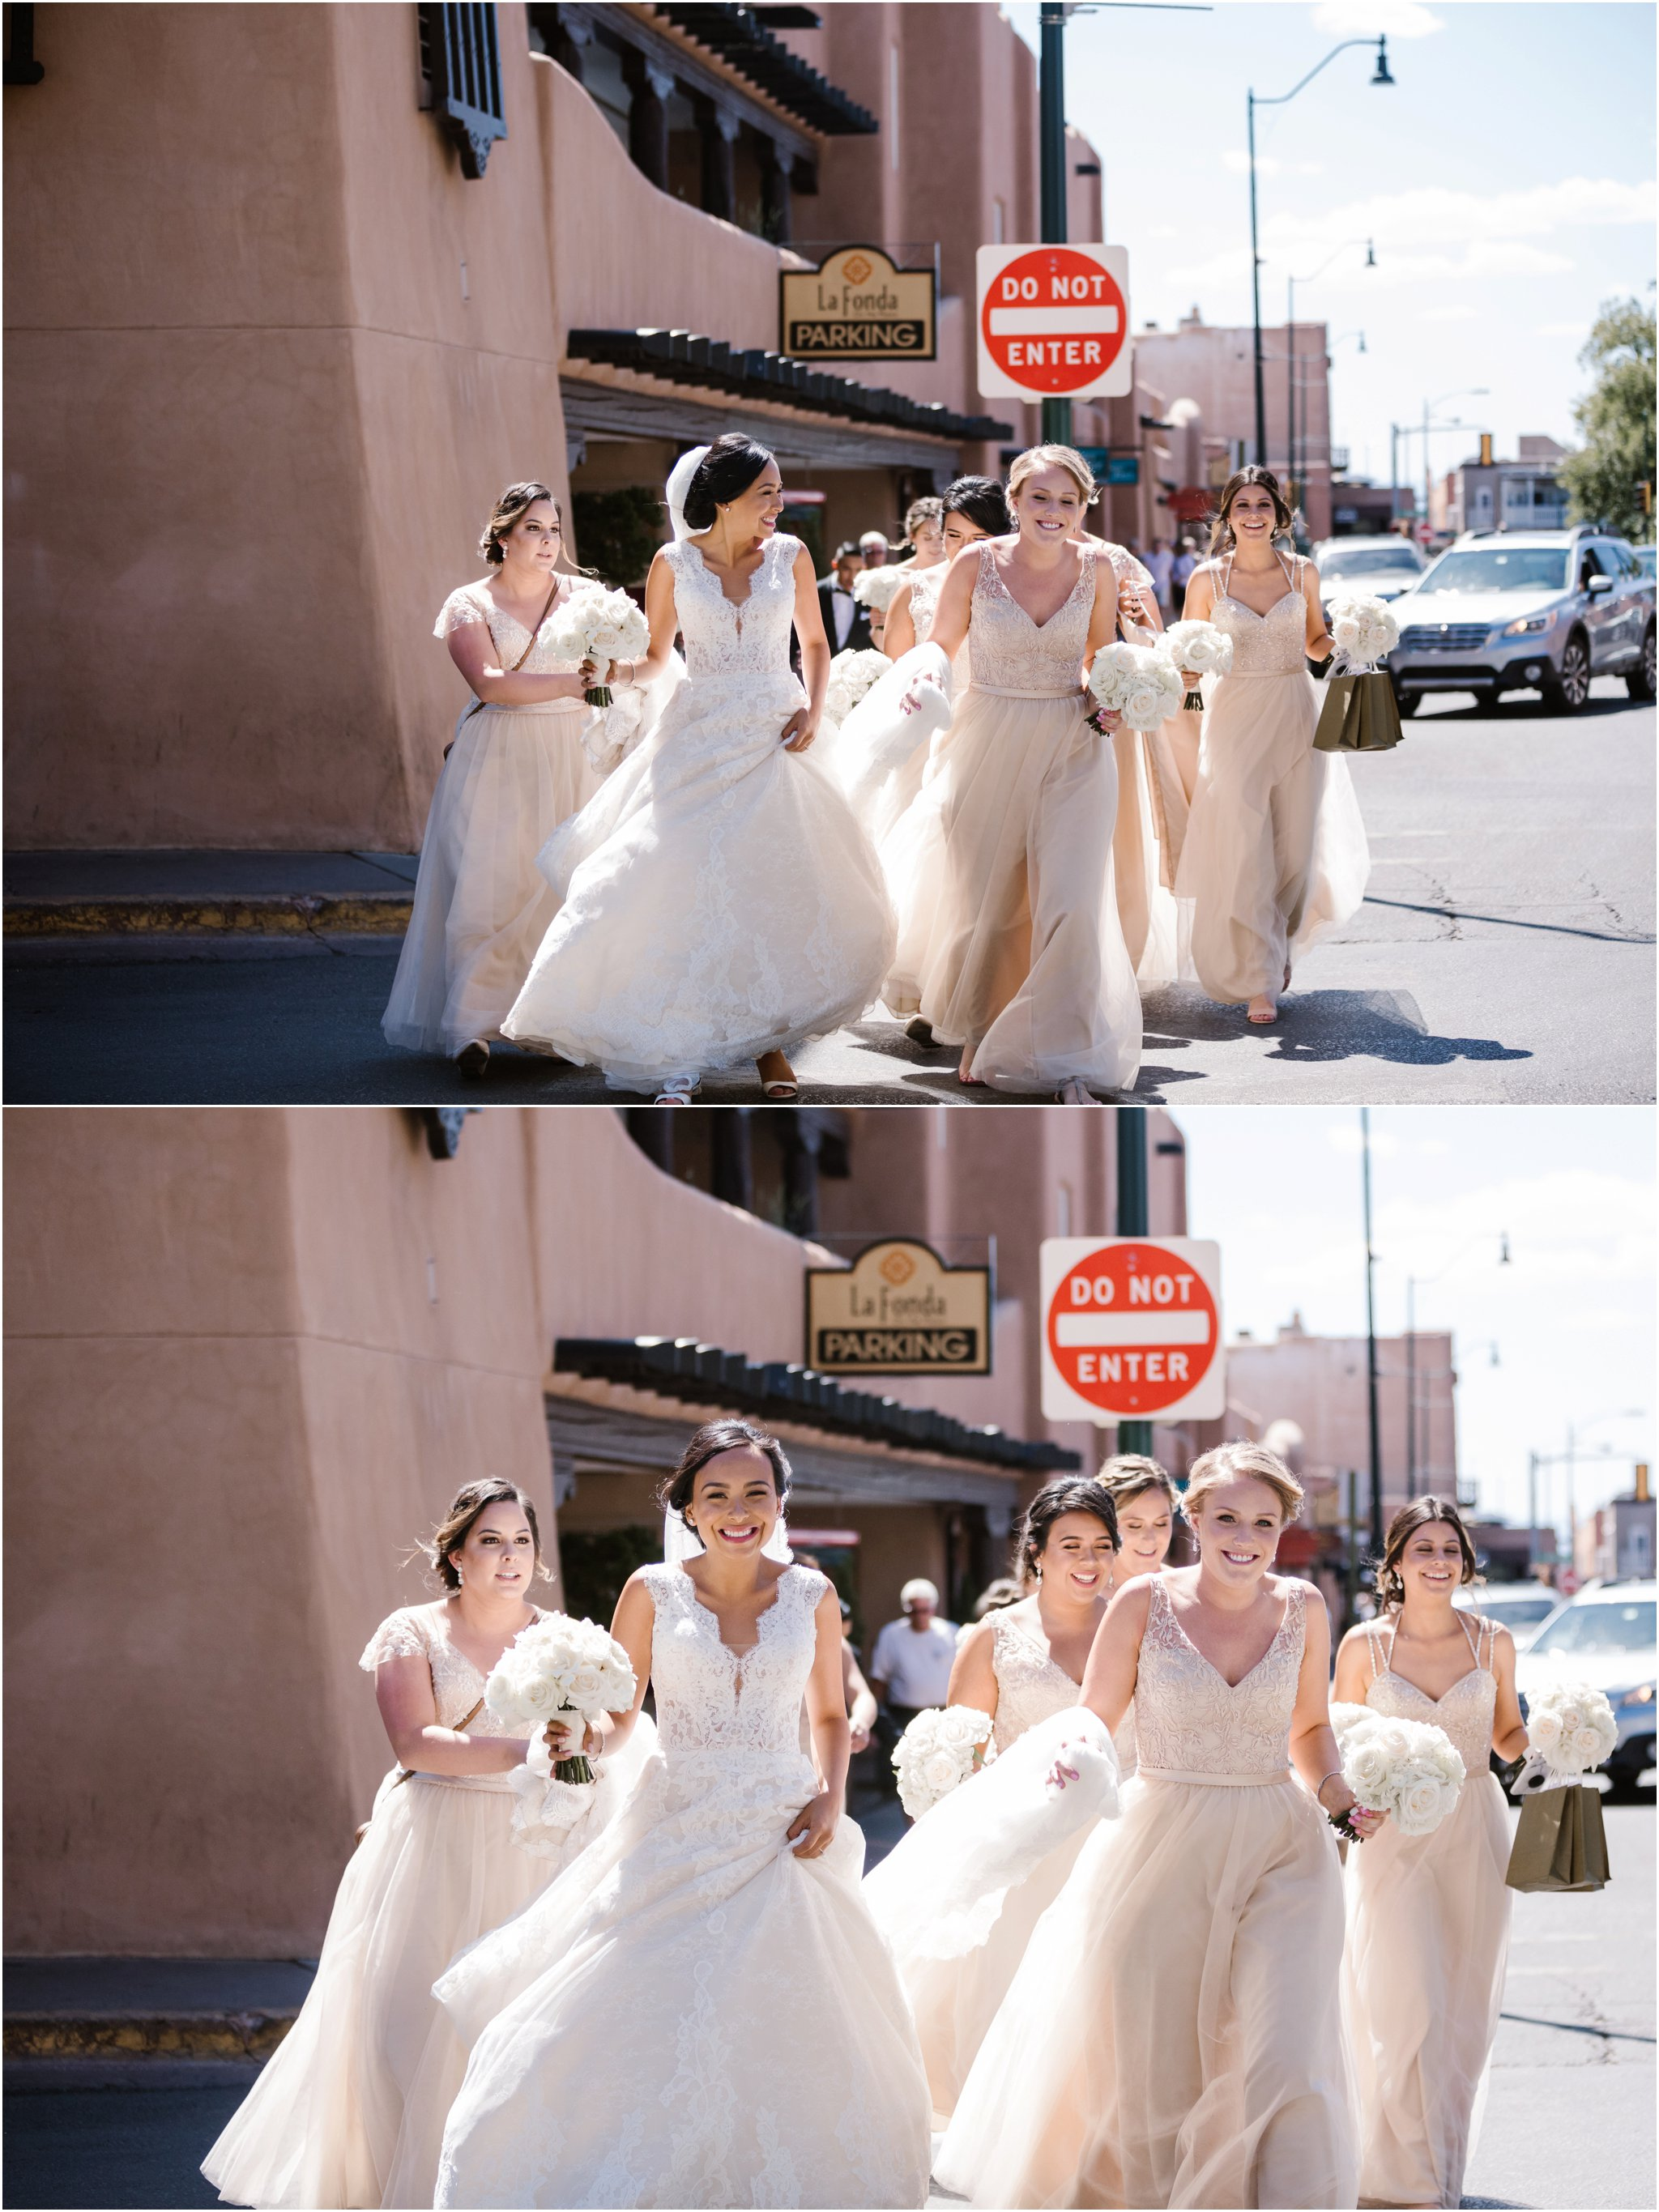 Santa Fe Wedding Photographers at La Fonda on the Plaza Hotel